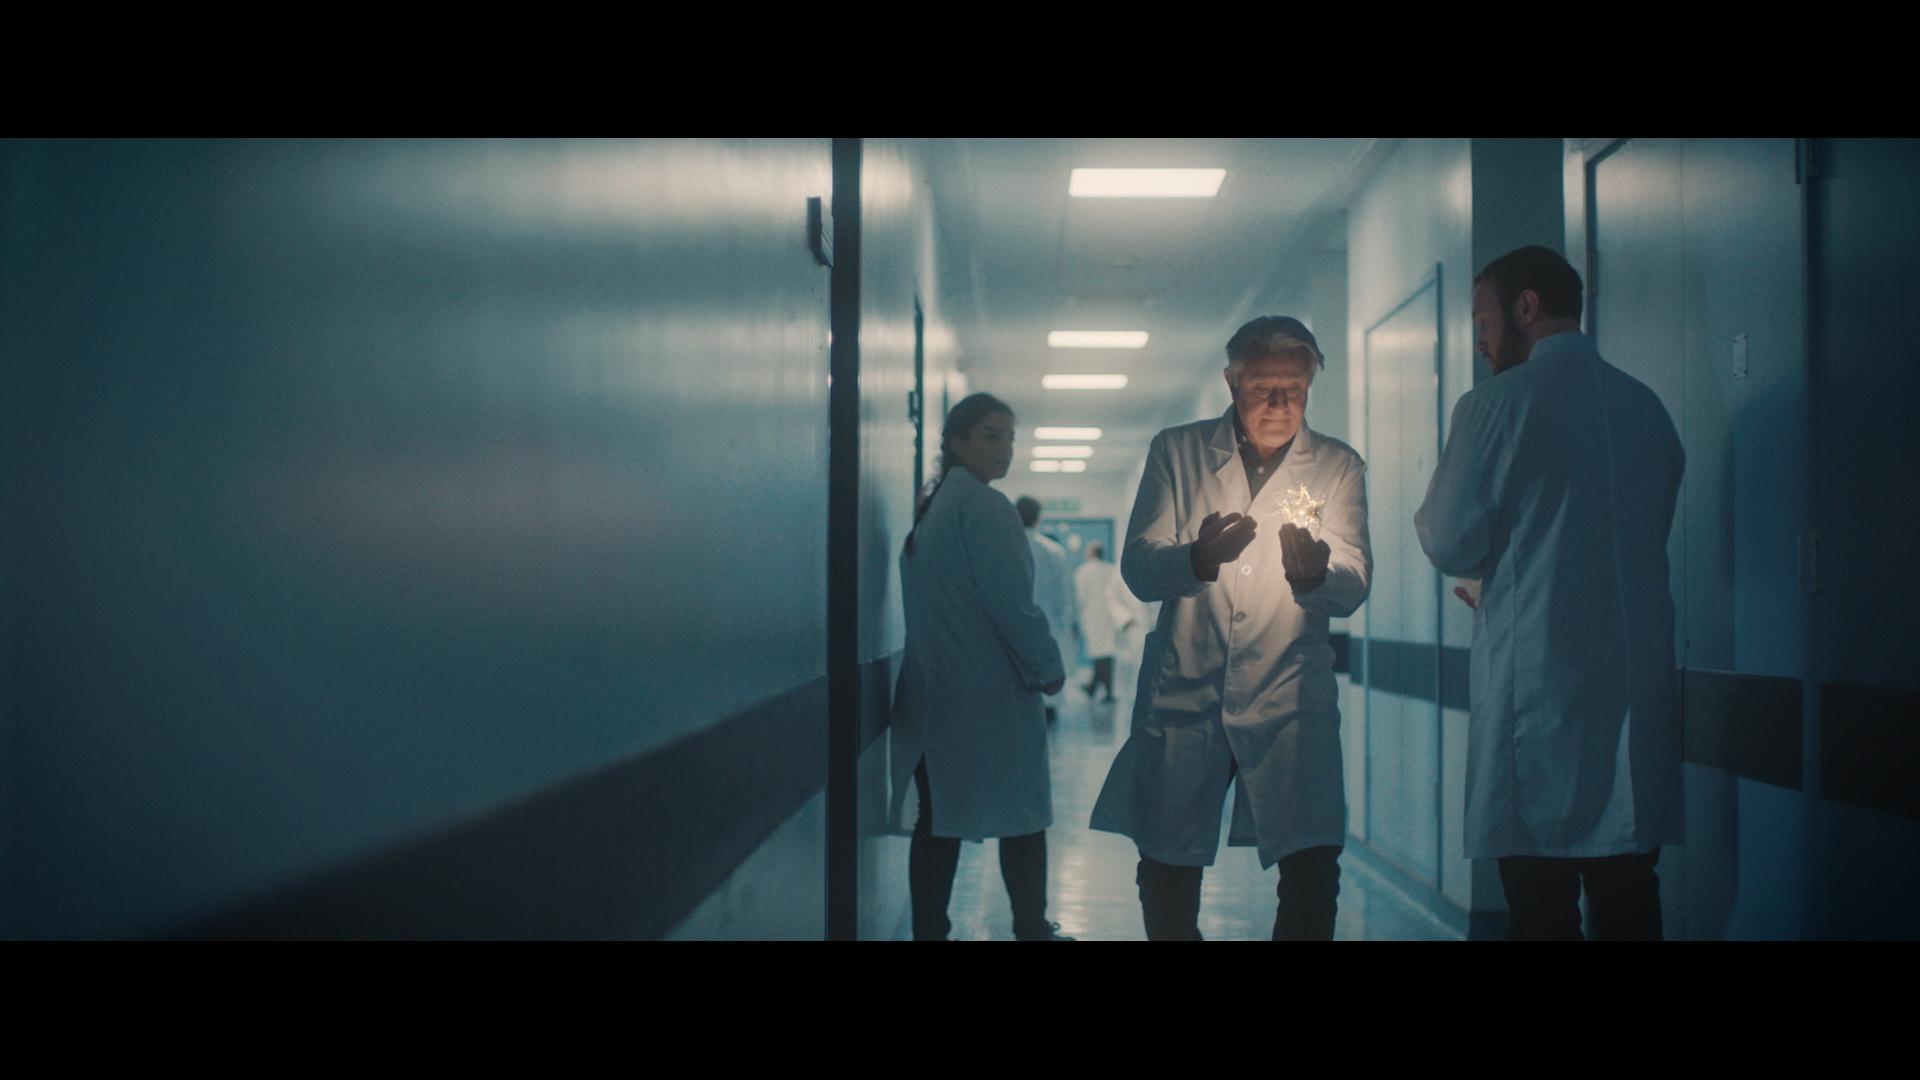 EFPIA THE SPARK - BRAND FILM